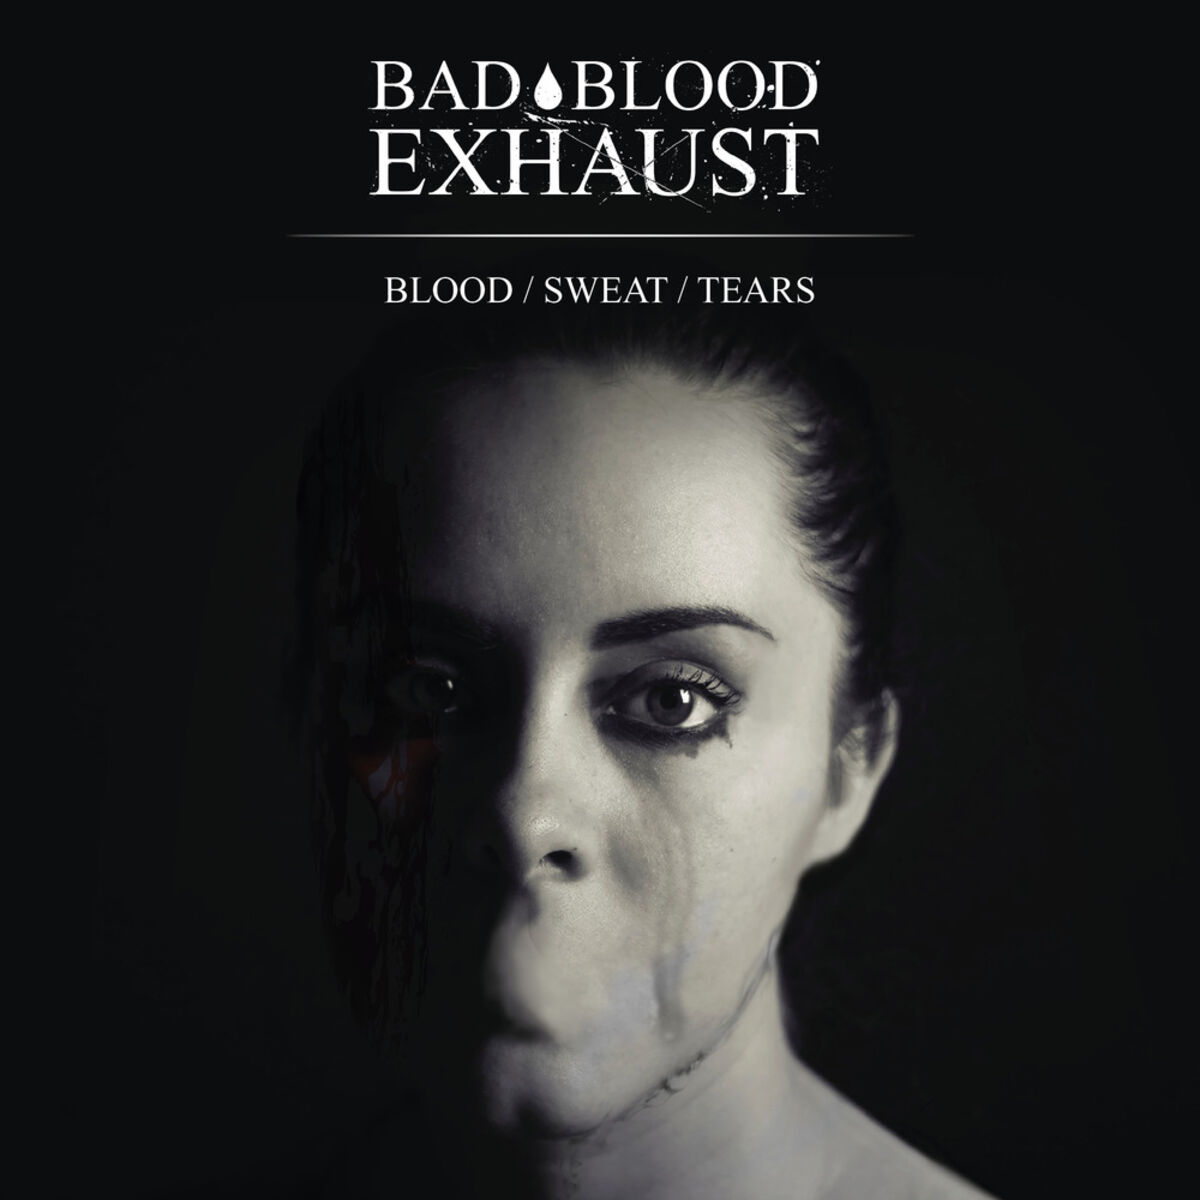 Bad Blood Exhaust - Blood / Sweat / Tears [EP] (2020)